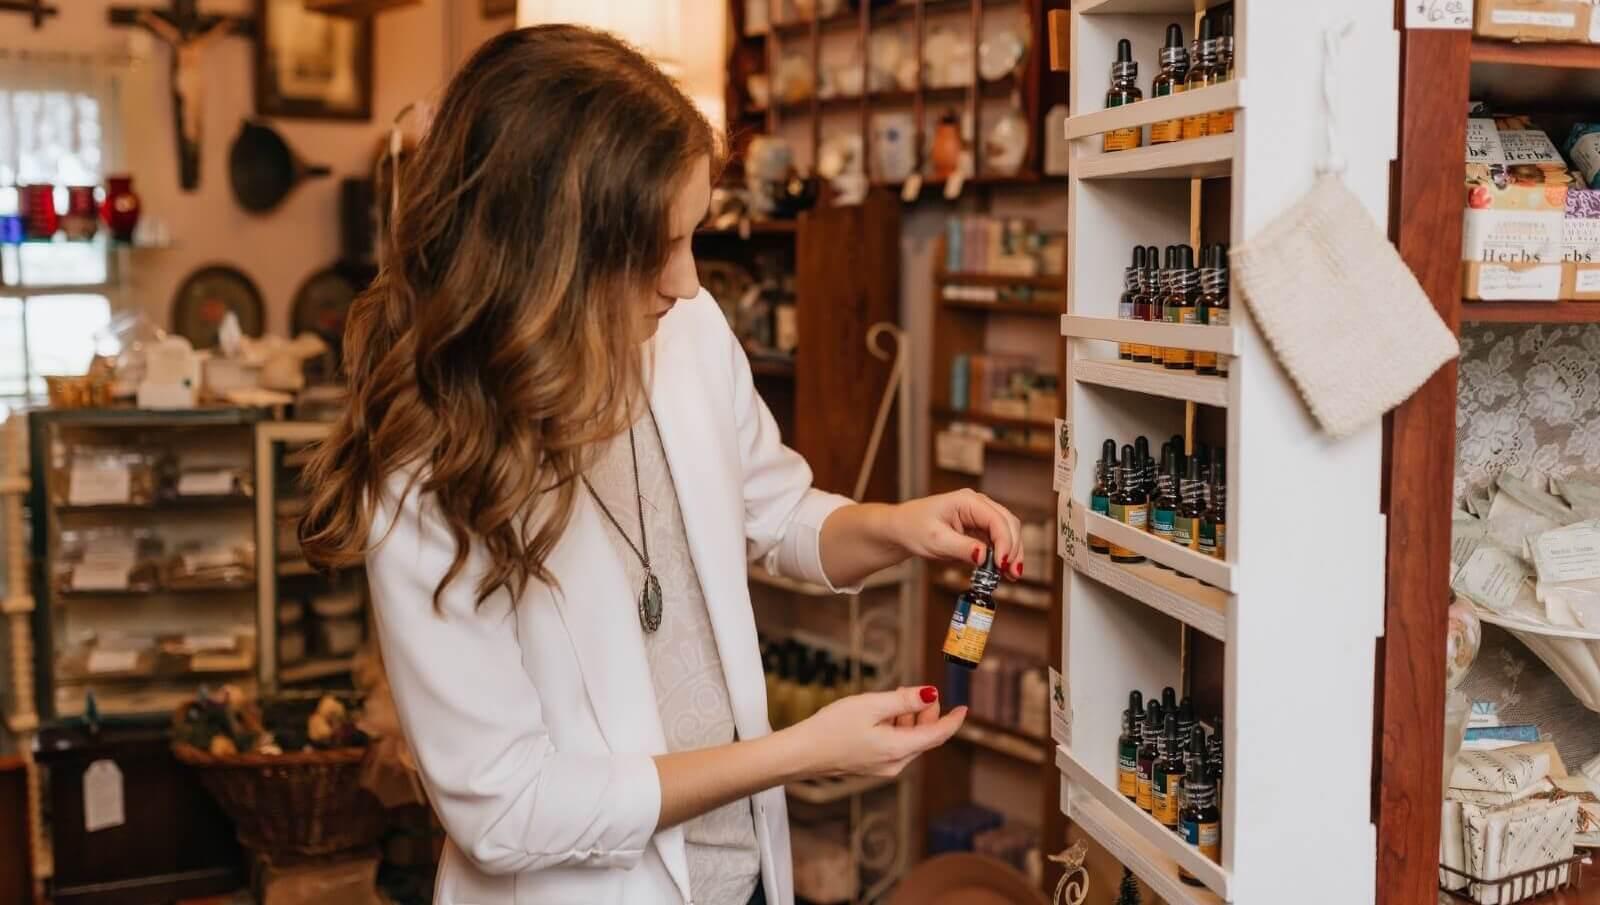 pharmacist looking at vitamins